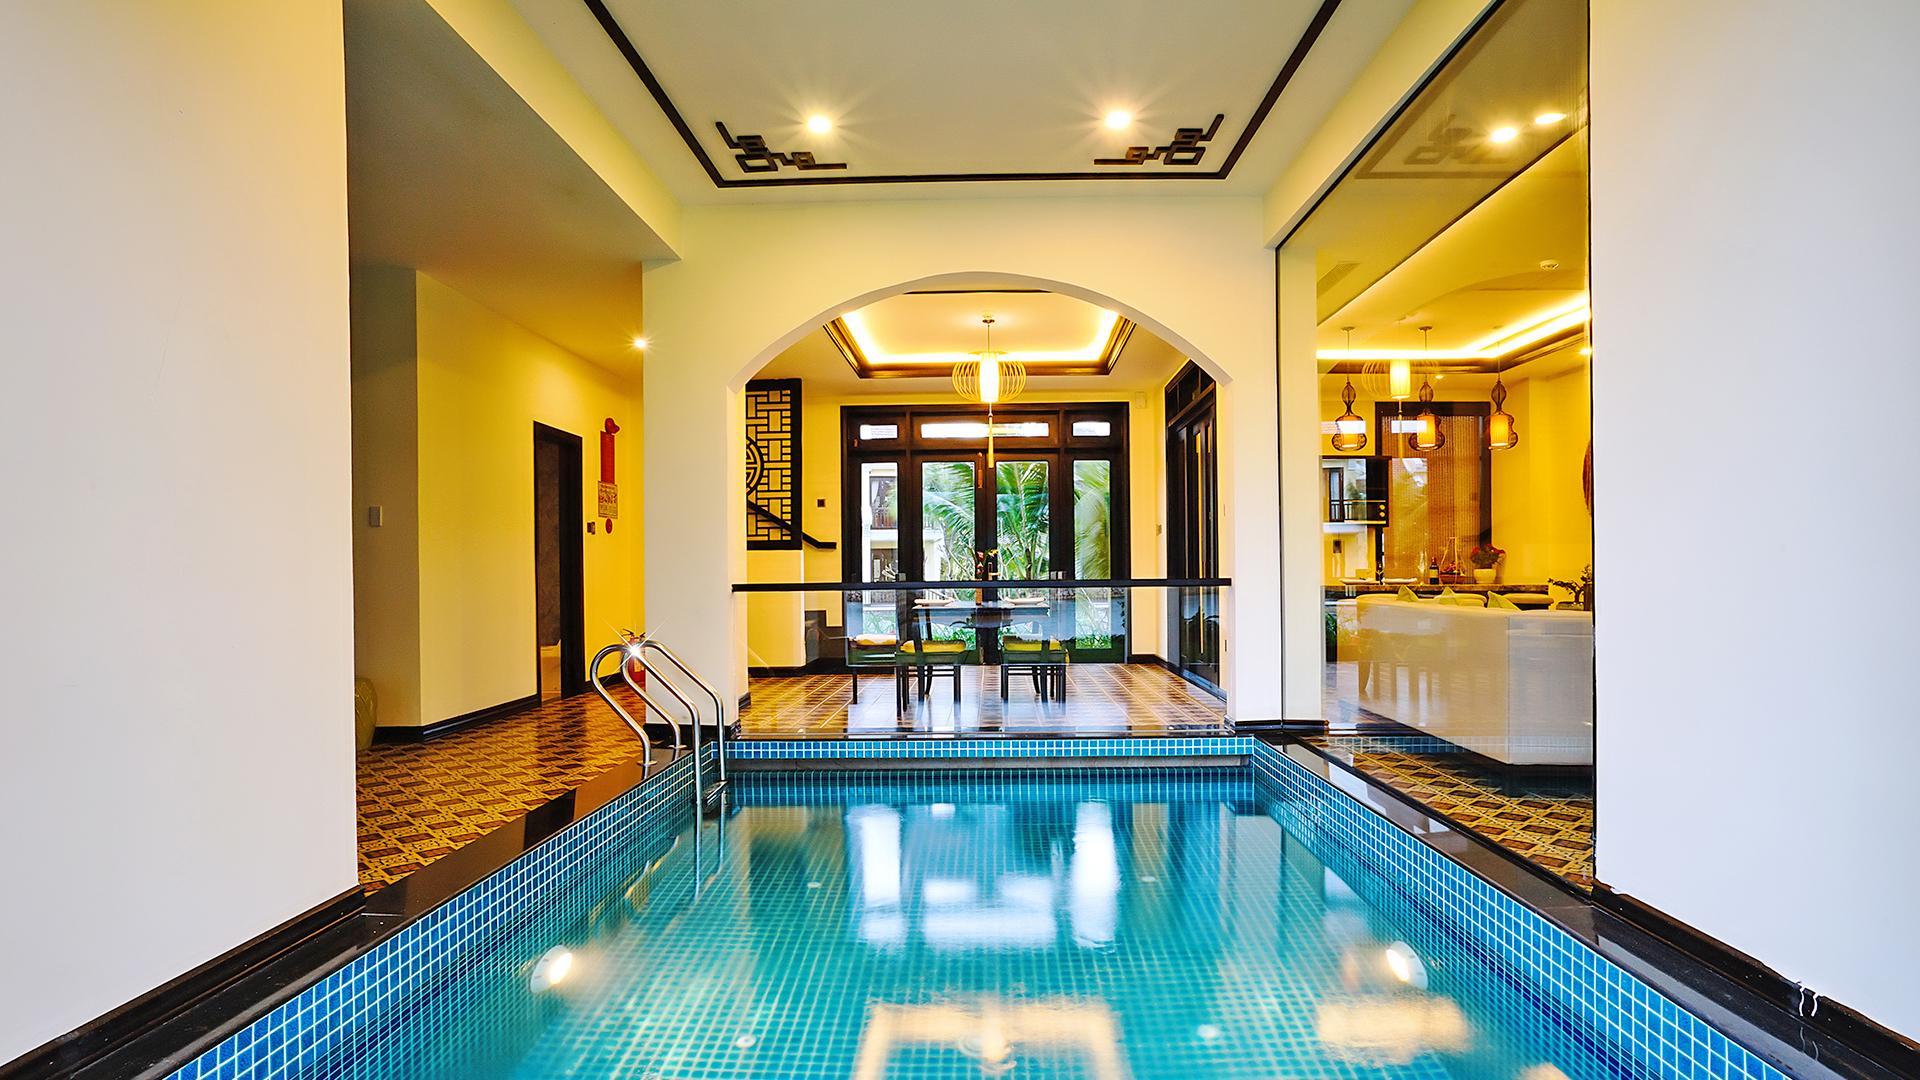 Riverside Pool Villa - Three Bedrooms image 1 at KOI Resort & Spa Hoi An - 2018 by null, Quảng Nam, Vietnam